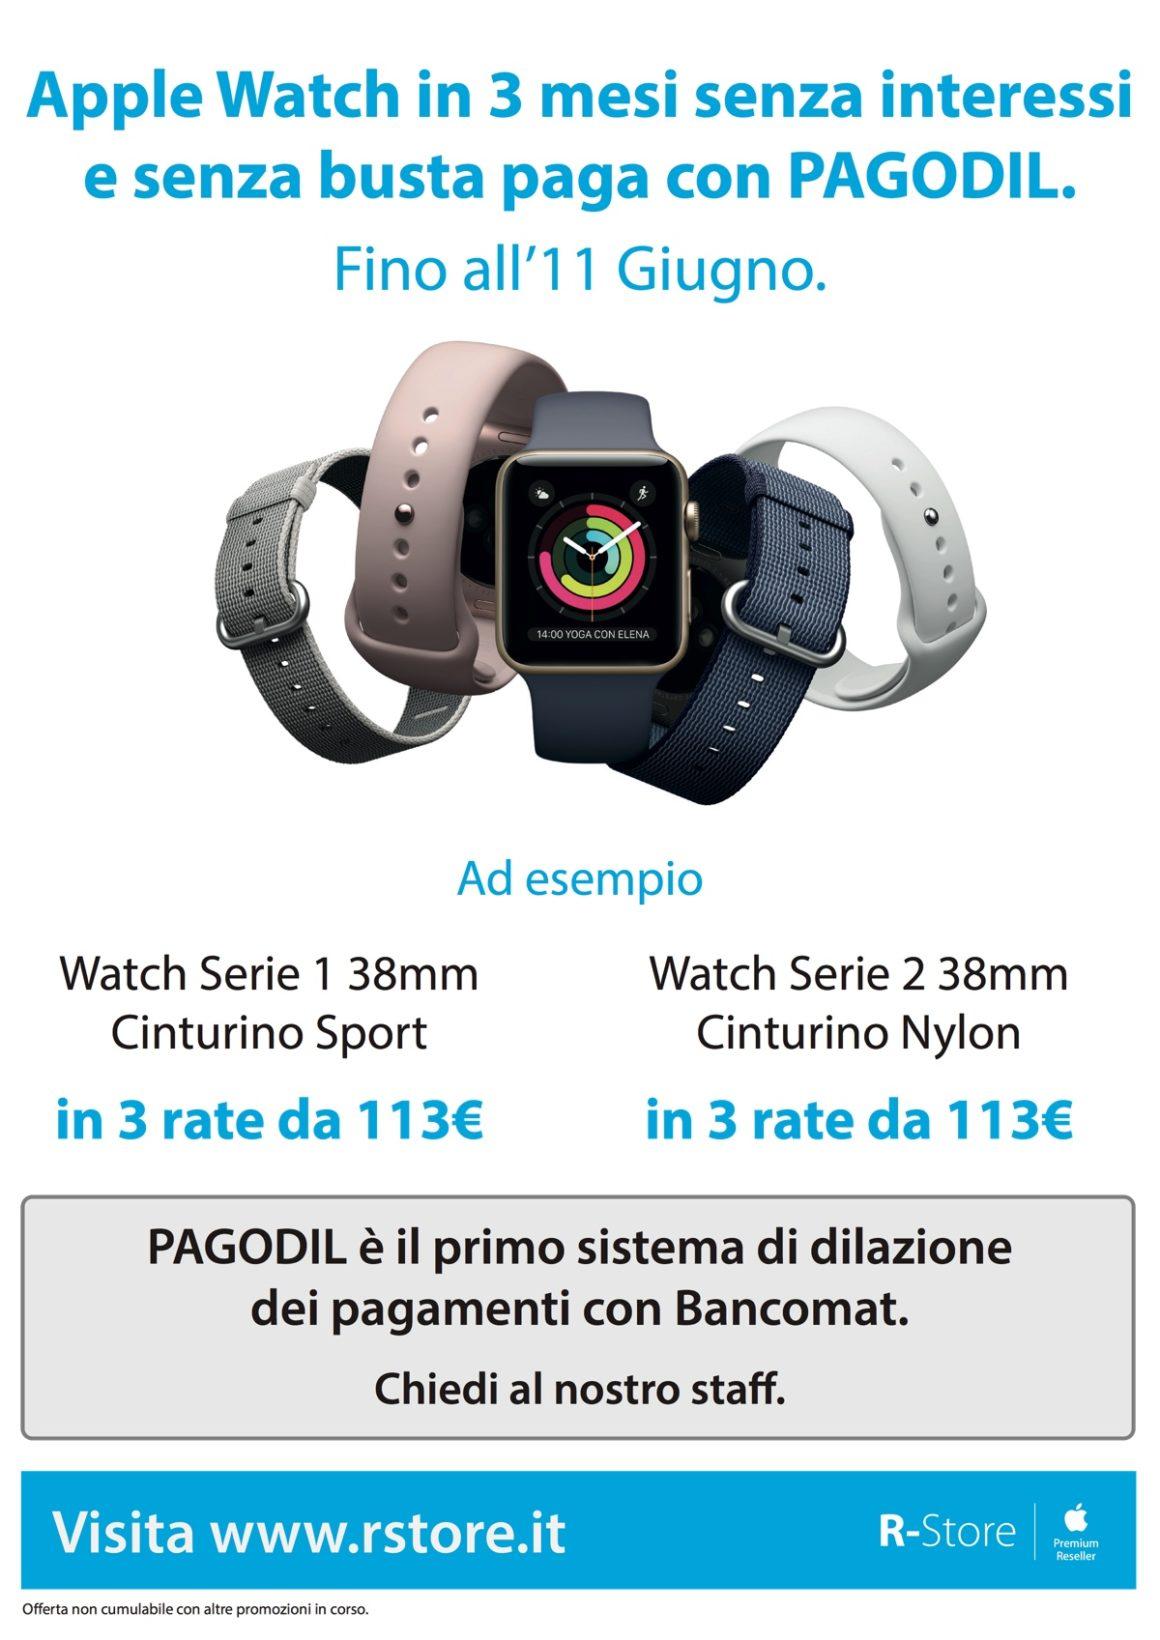 r-store apple watch 1200